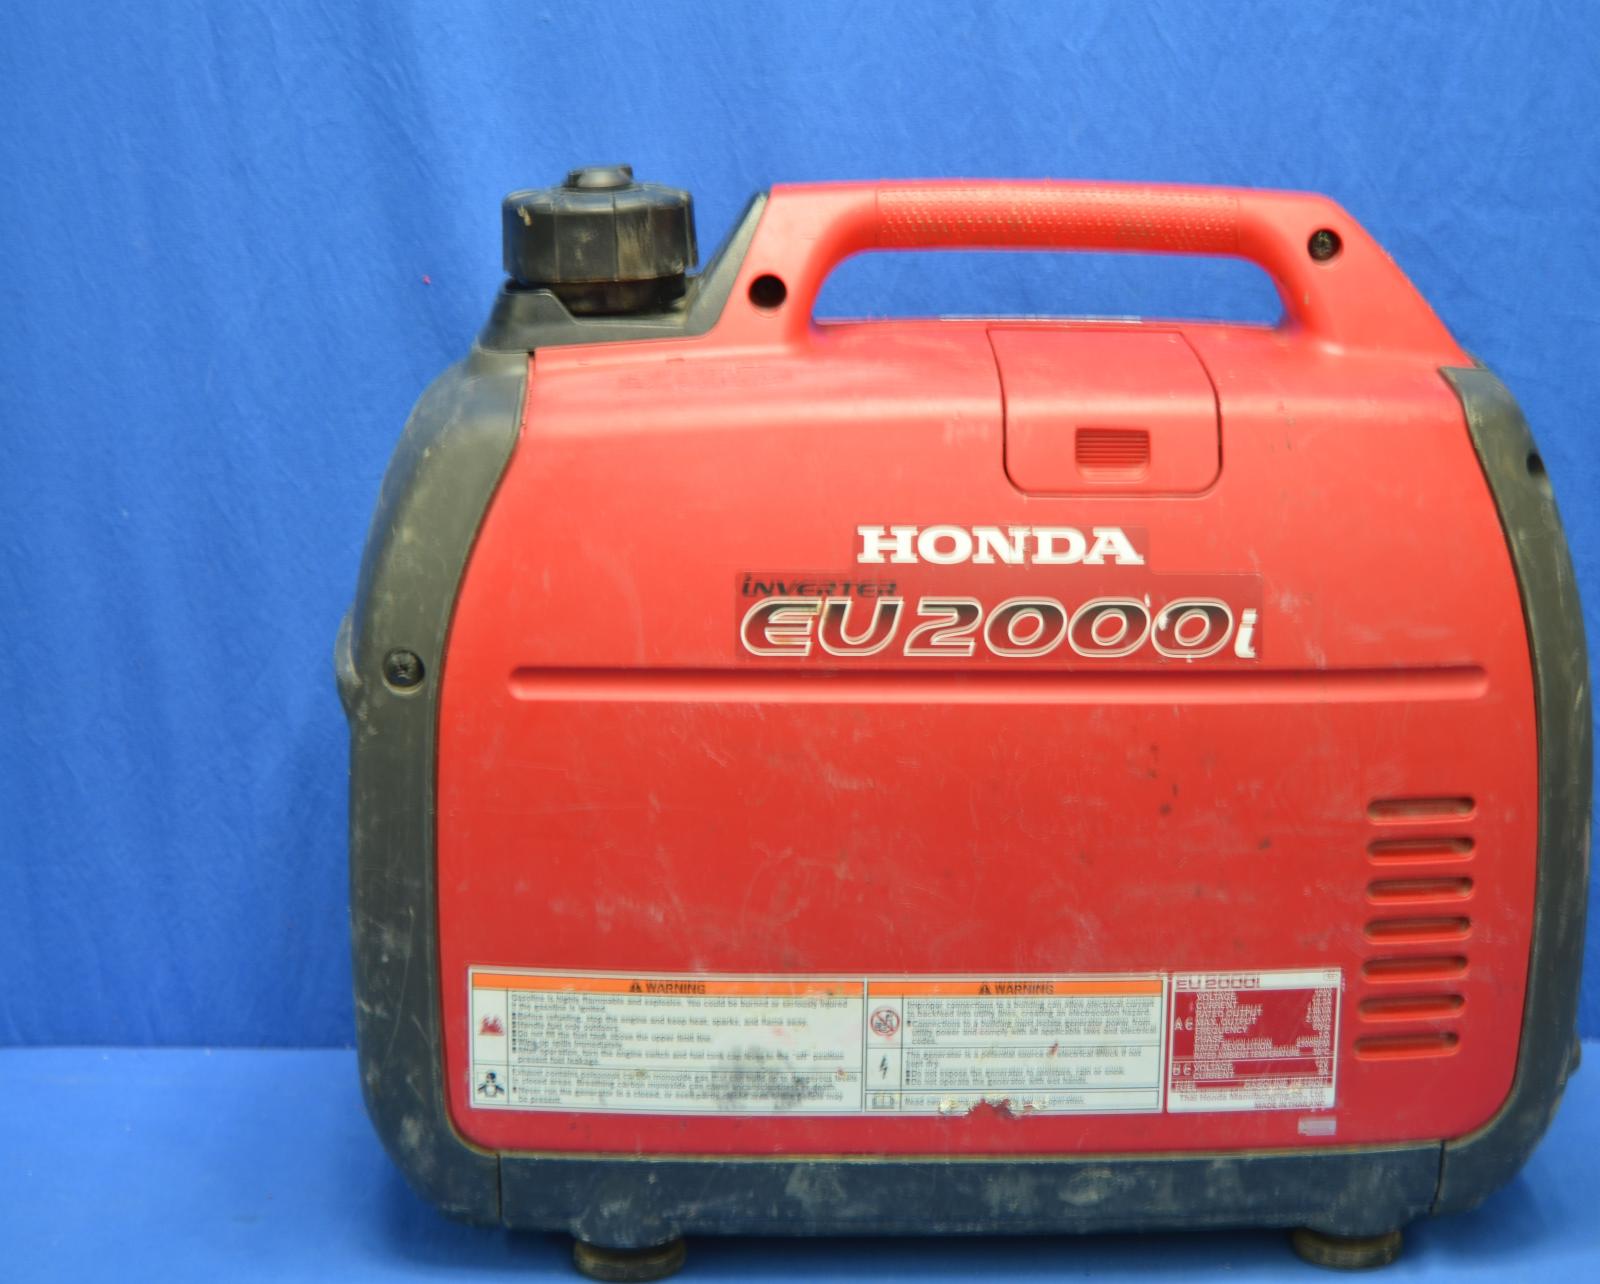 Honda EU2000i 2000 Watt 3 5 HP Inverter Generator